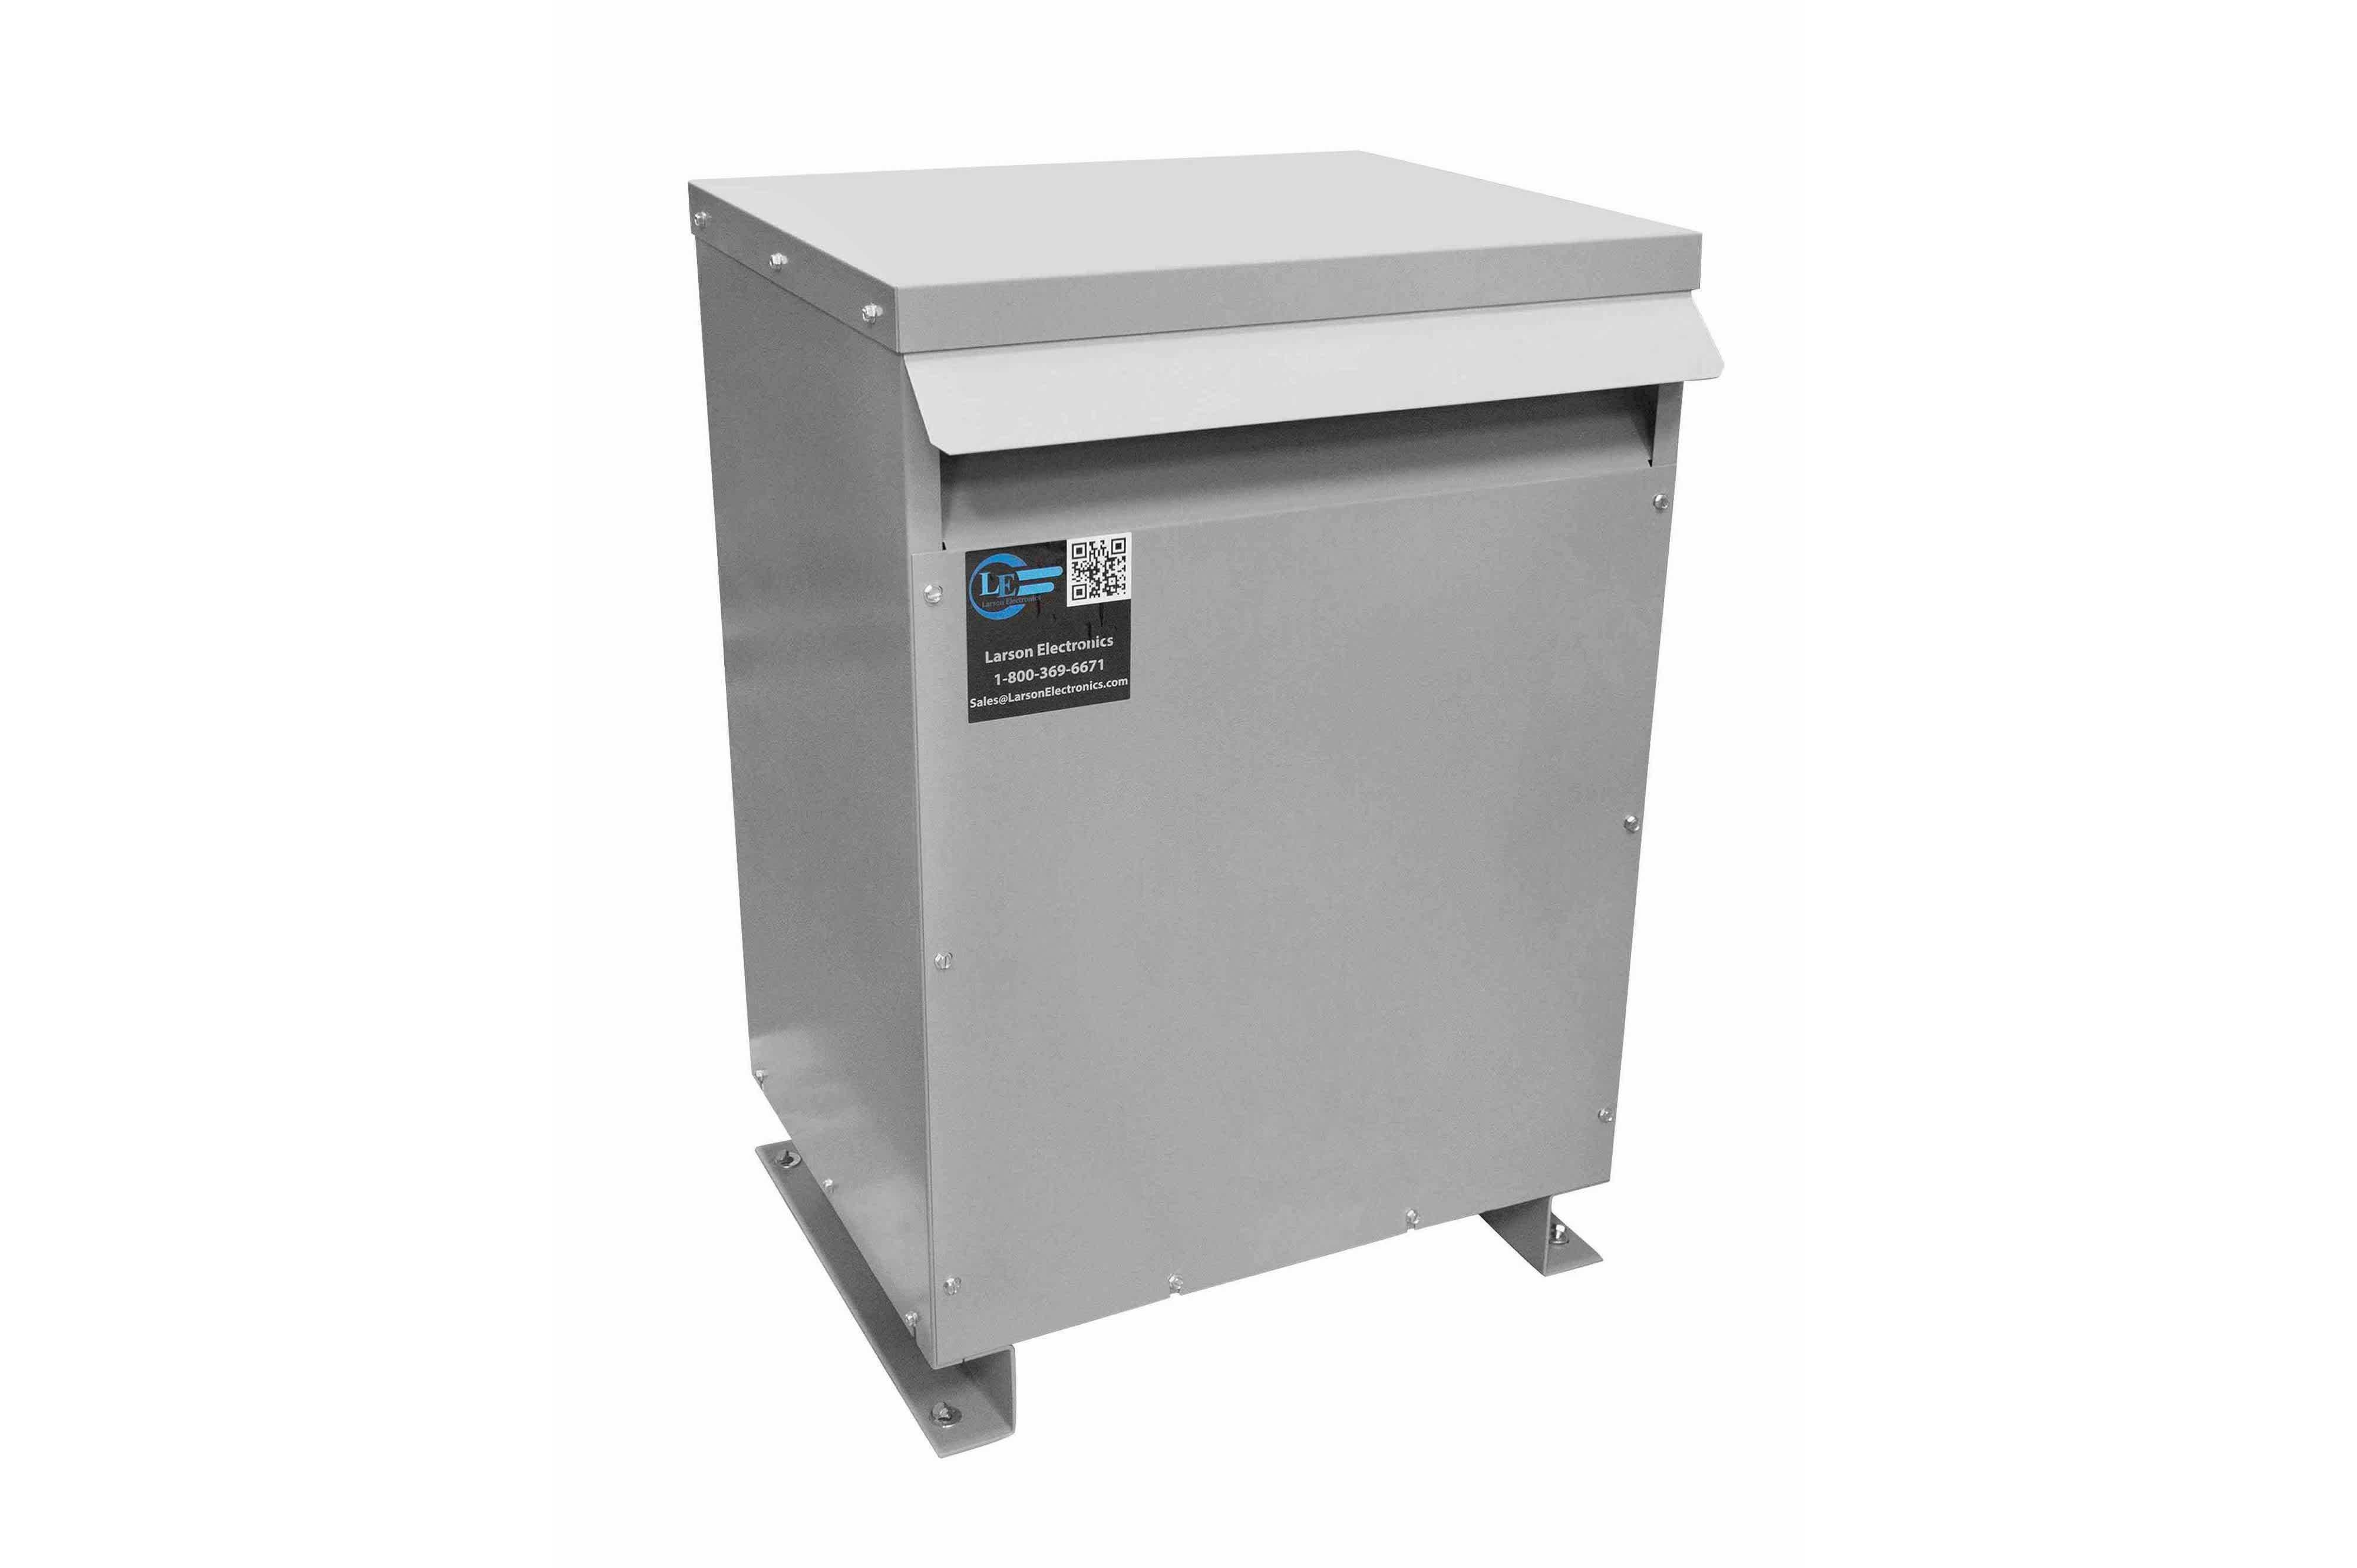 13 kVA 3PH Isolation Transformer, 600V Wye Primary, 208V Delta Secondary, N3R, Ventilated, 60 Hz